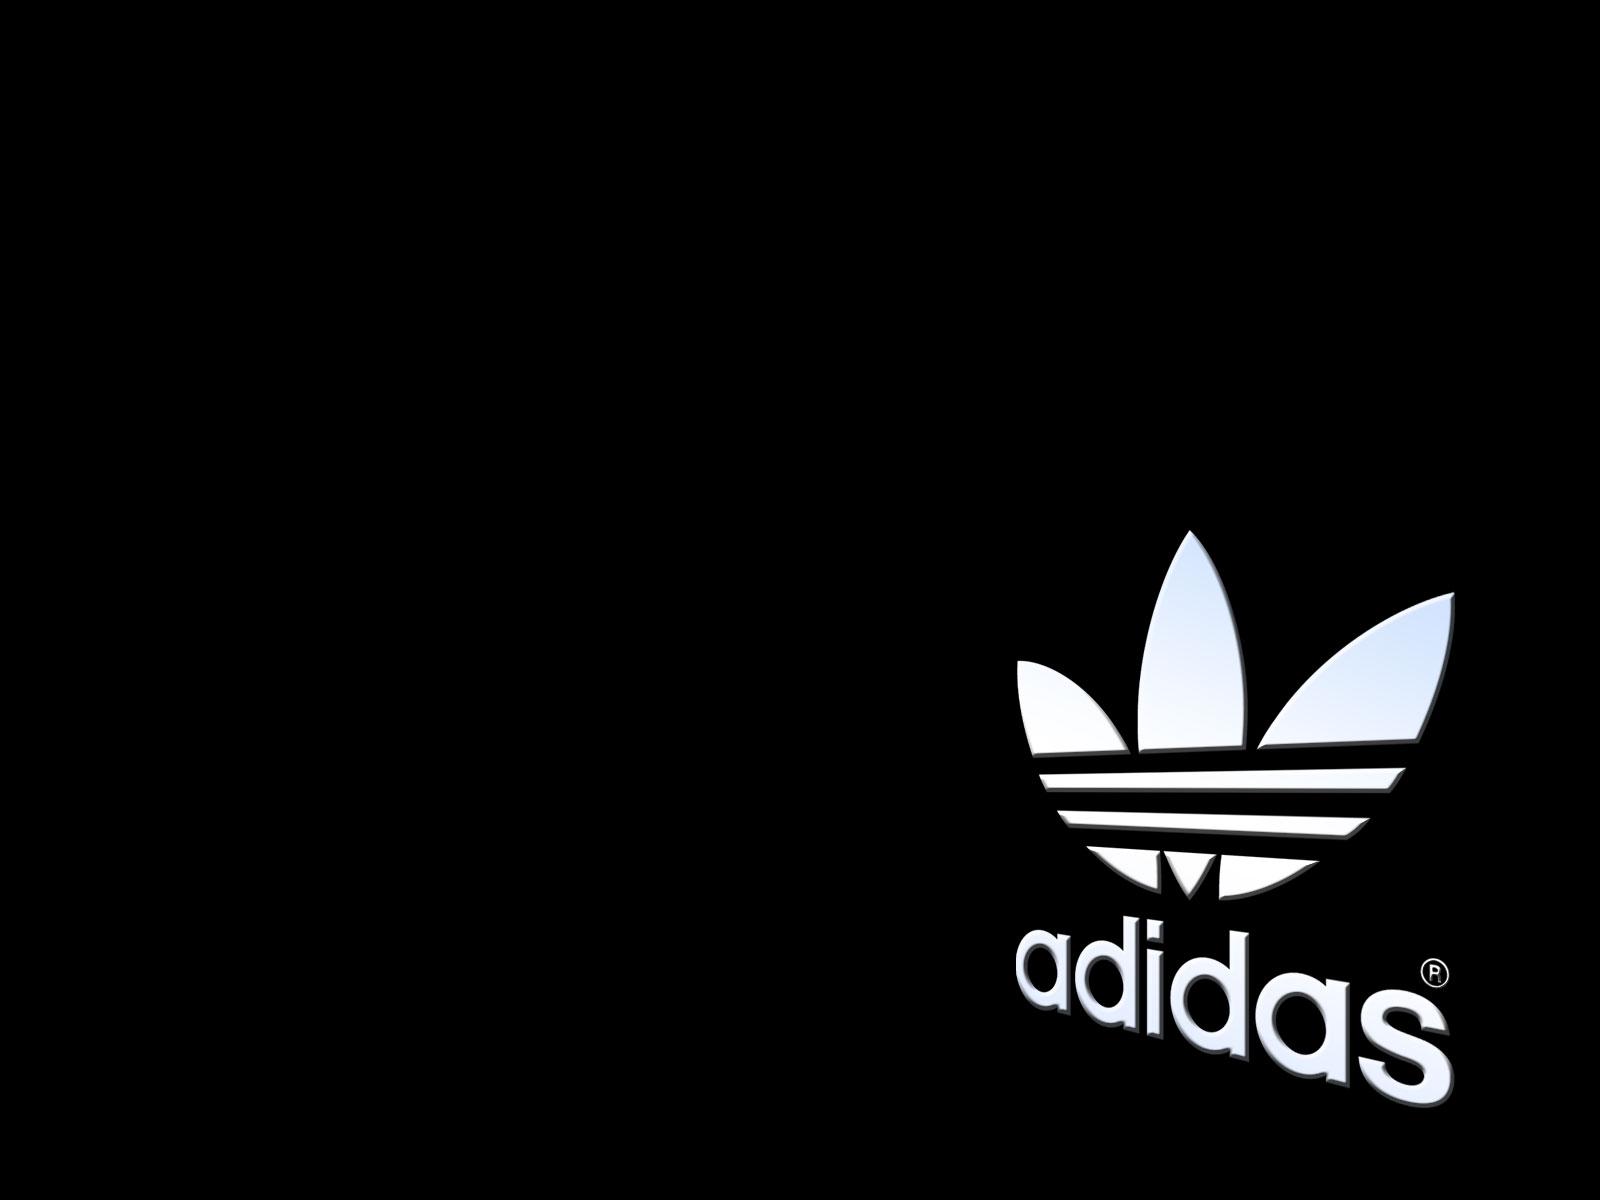 Adidas Adidas 壁紙 213895 ファンポップ